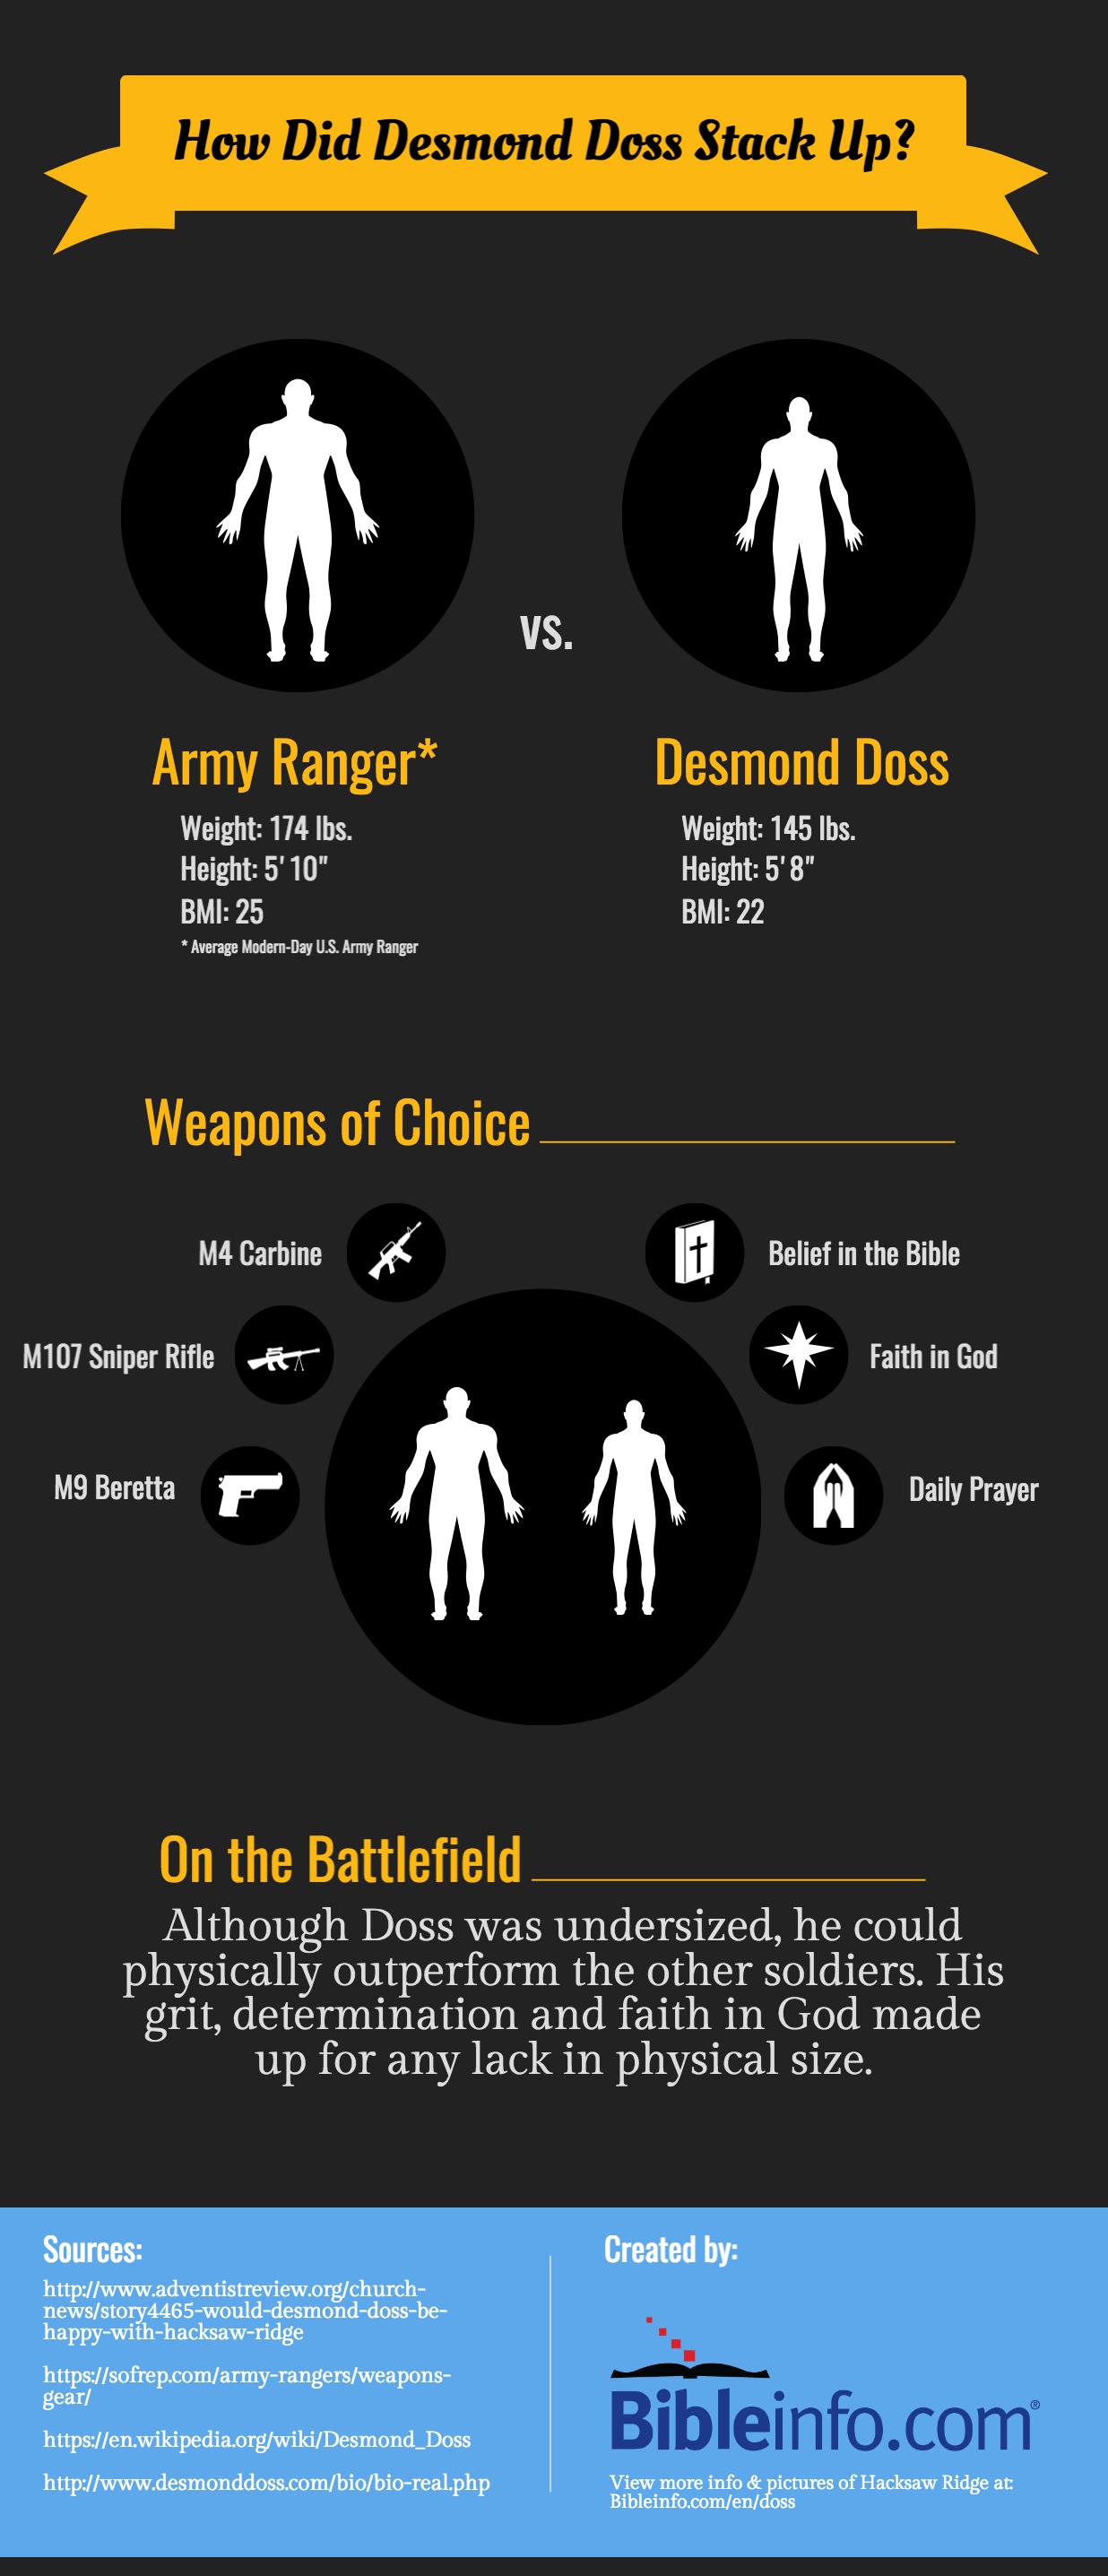 Desmond Doss versus Army Ranger Infographic